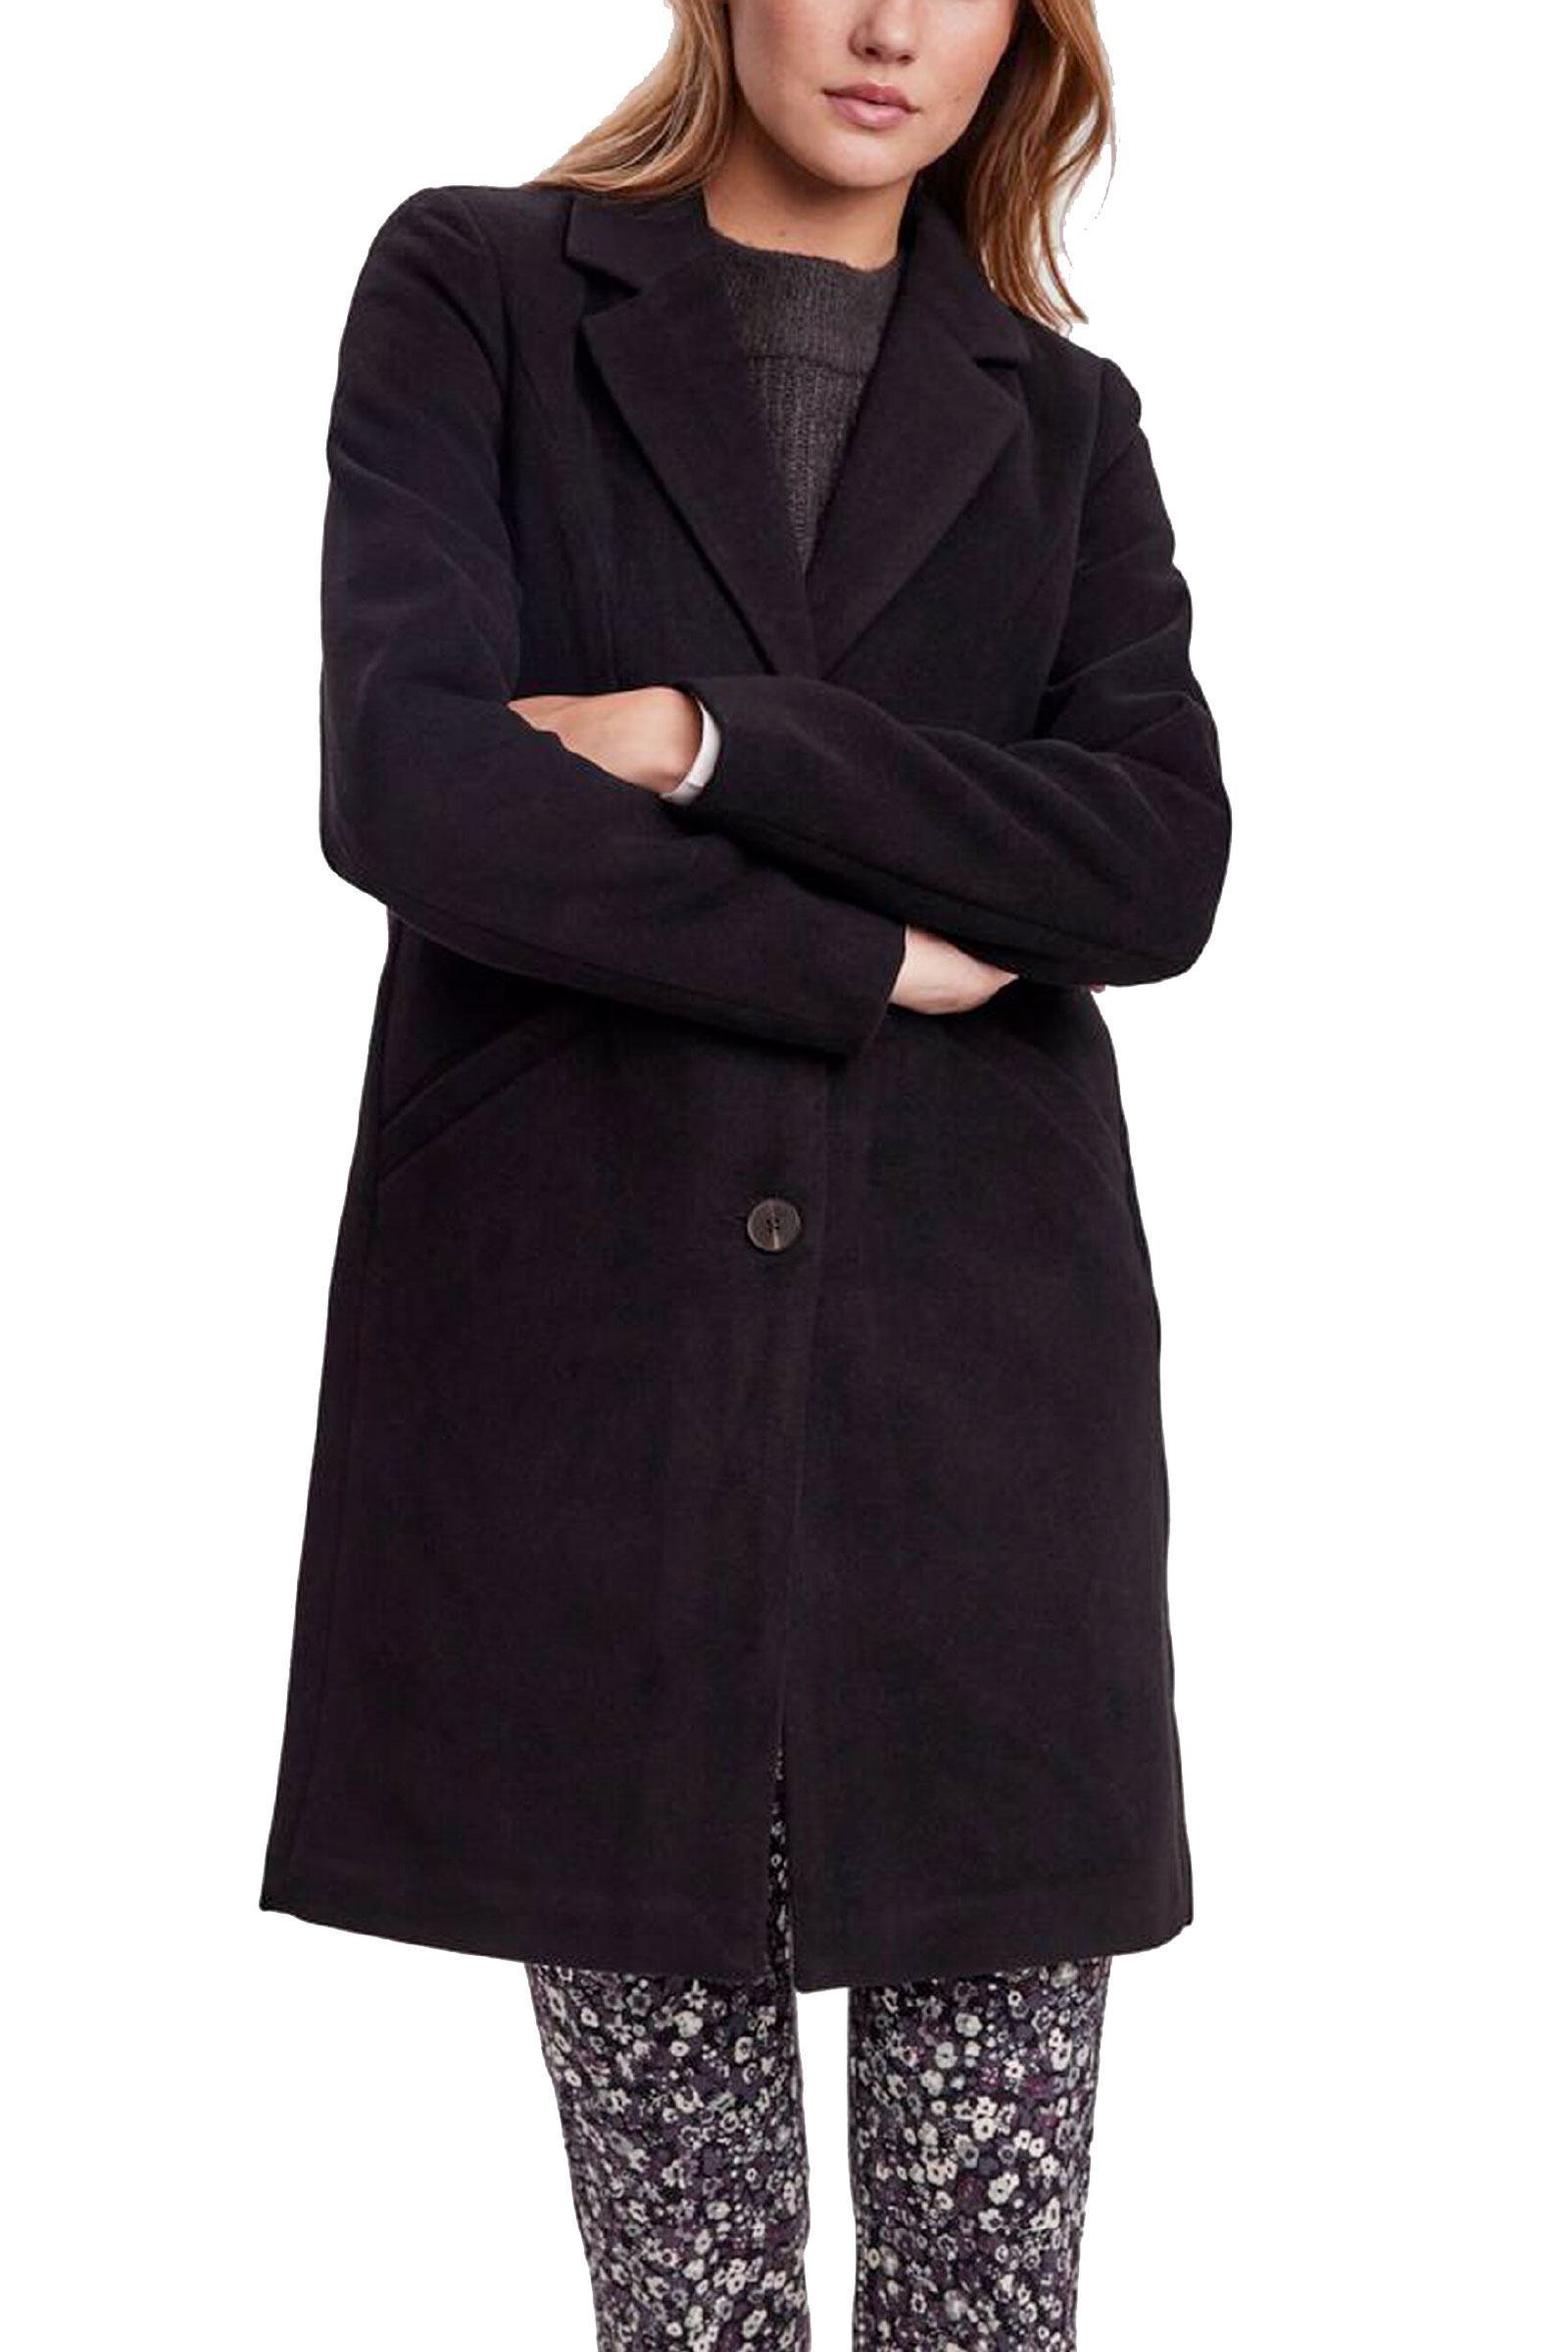 VERO MODA   Coat   10248270Black